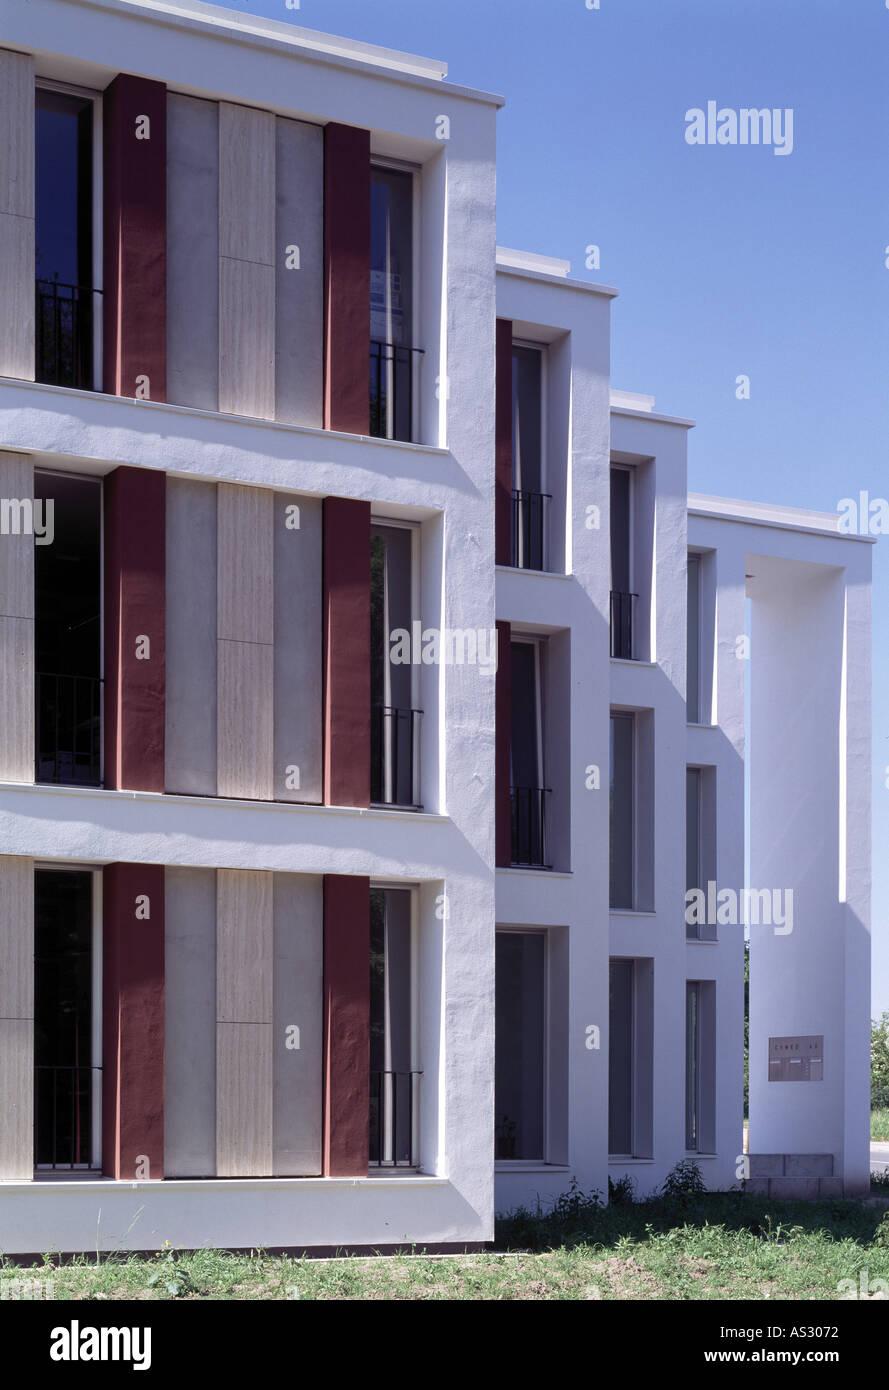 Architektur Dortmund architektur dortmund hausdesigns co